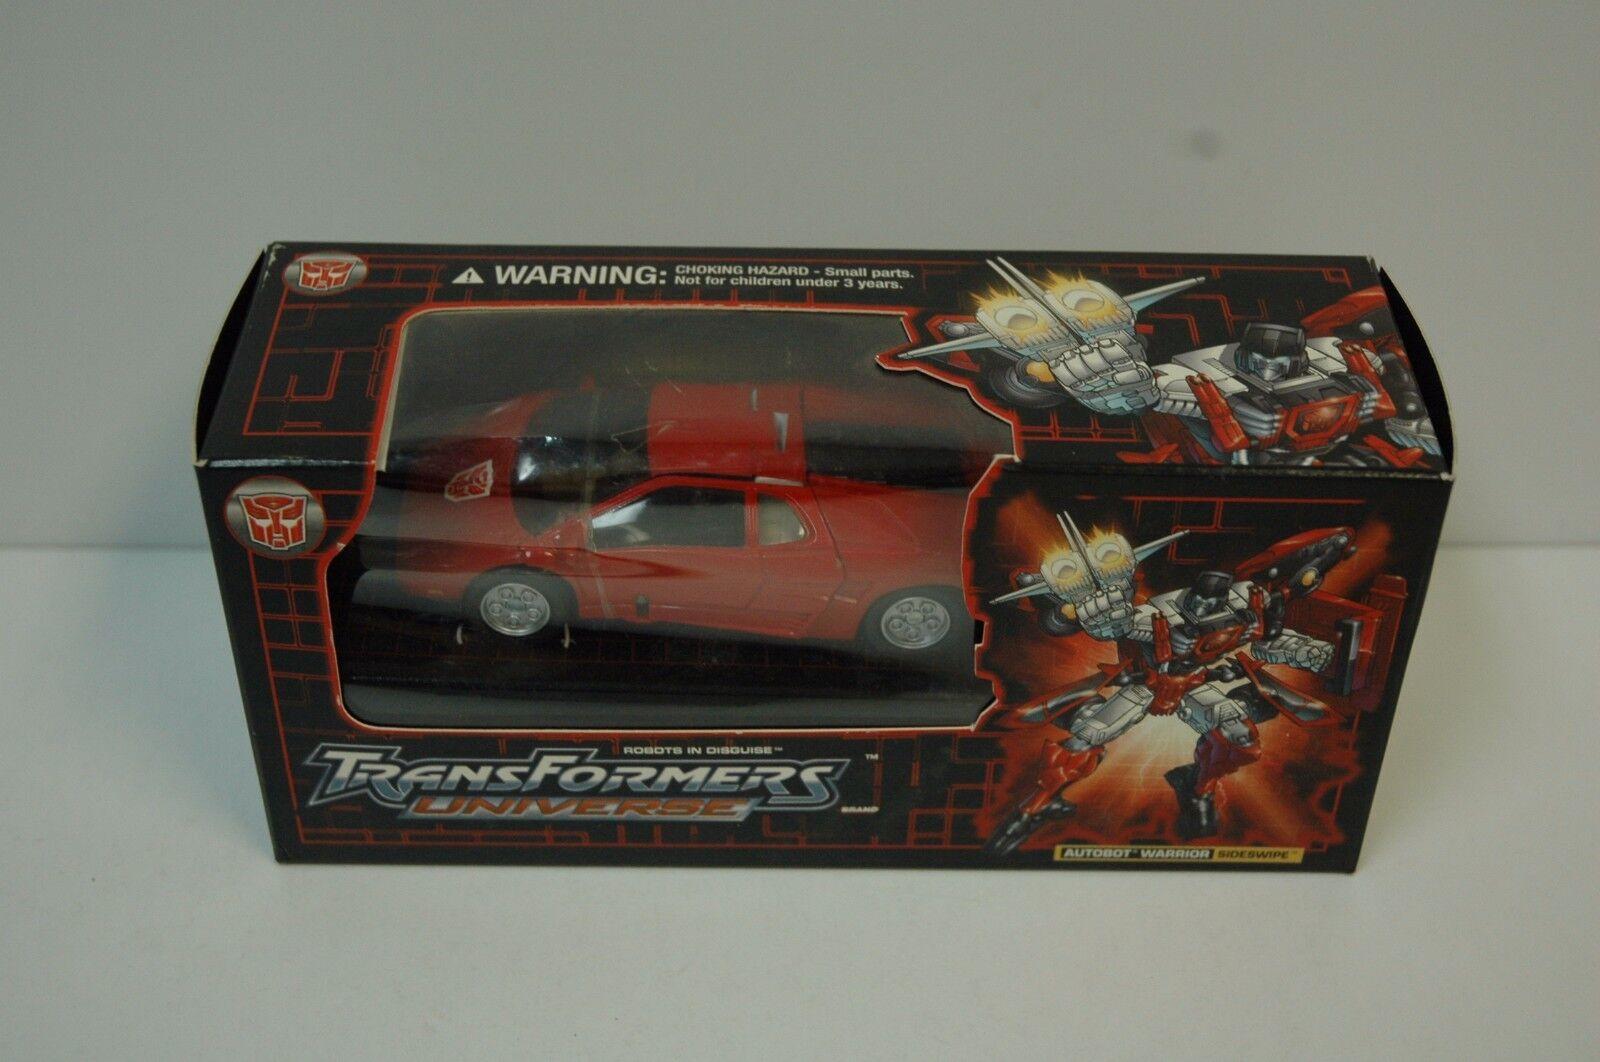 Transformers Transformers Transformers SIDESWIPE AUTOBOT WARRIOR Universe MIB Botcon bfdd3a